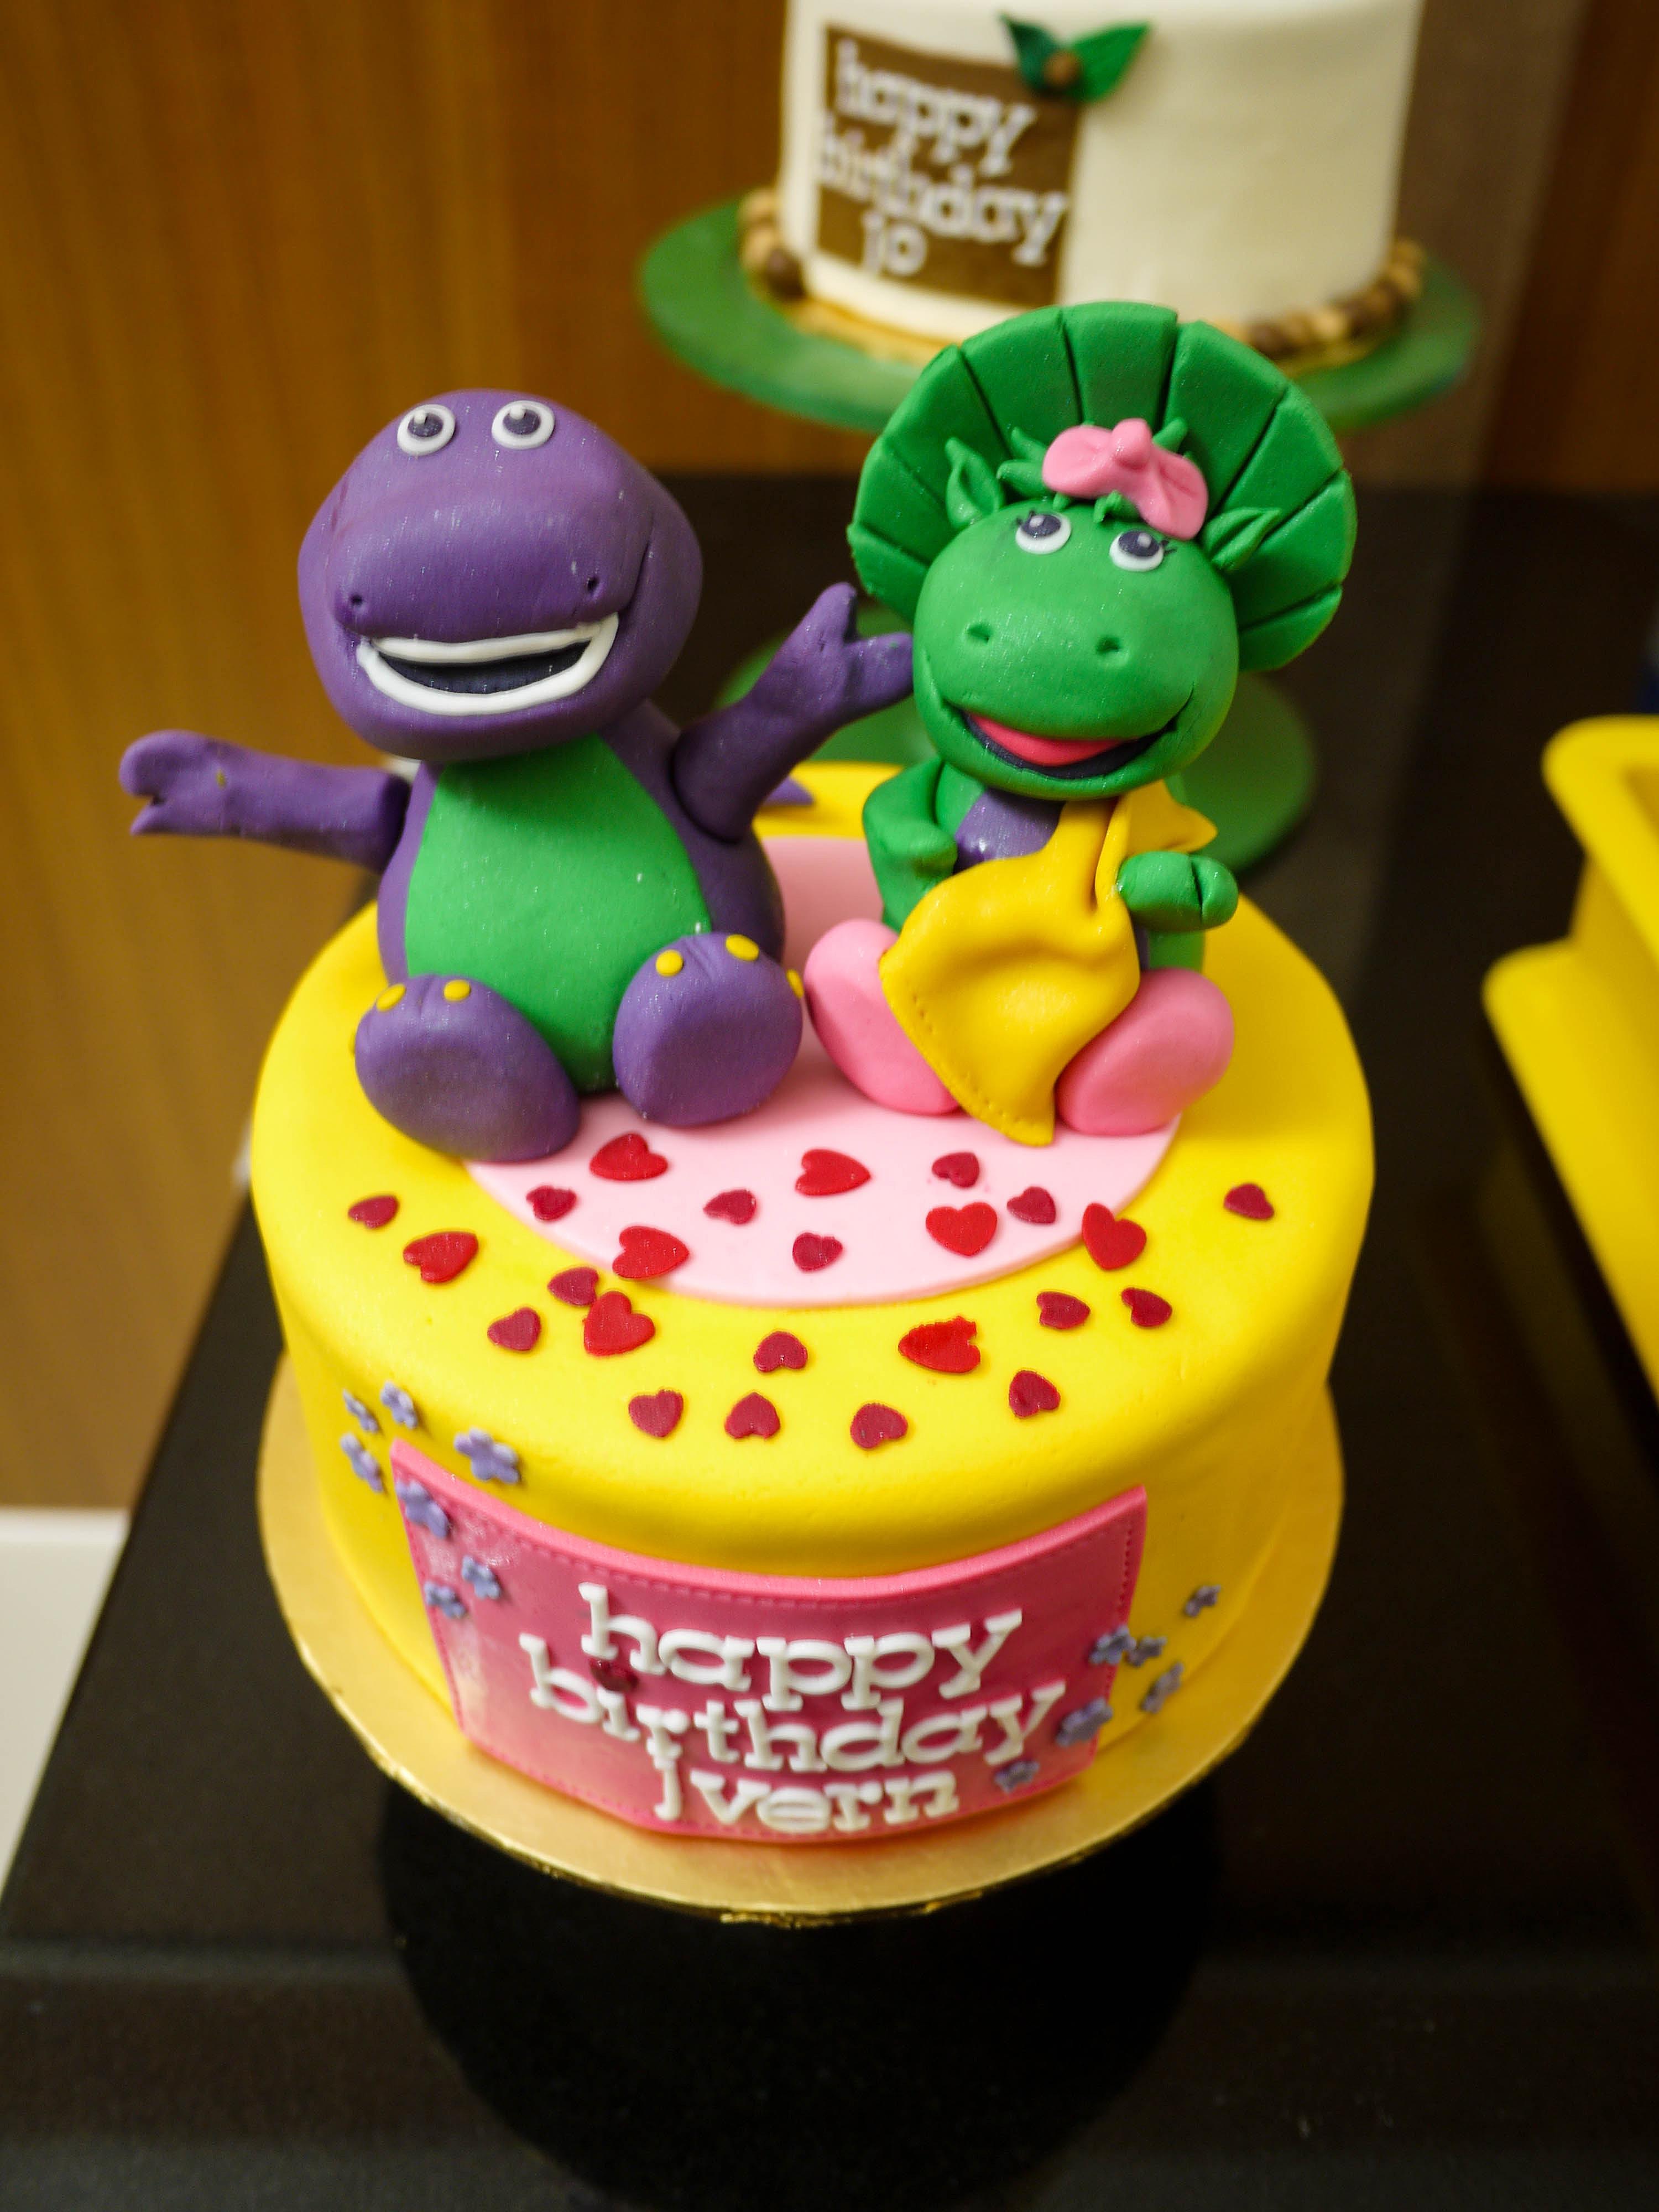 Birthday Cake Design Kl Dmost for